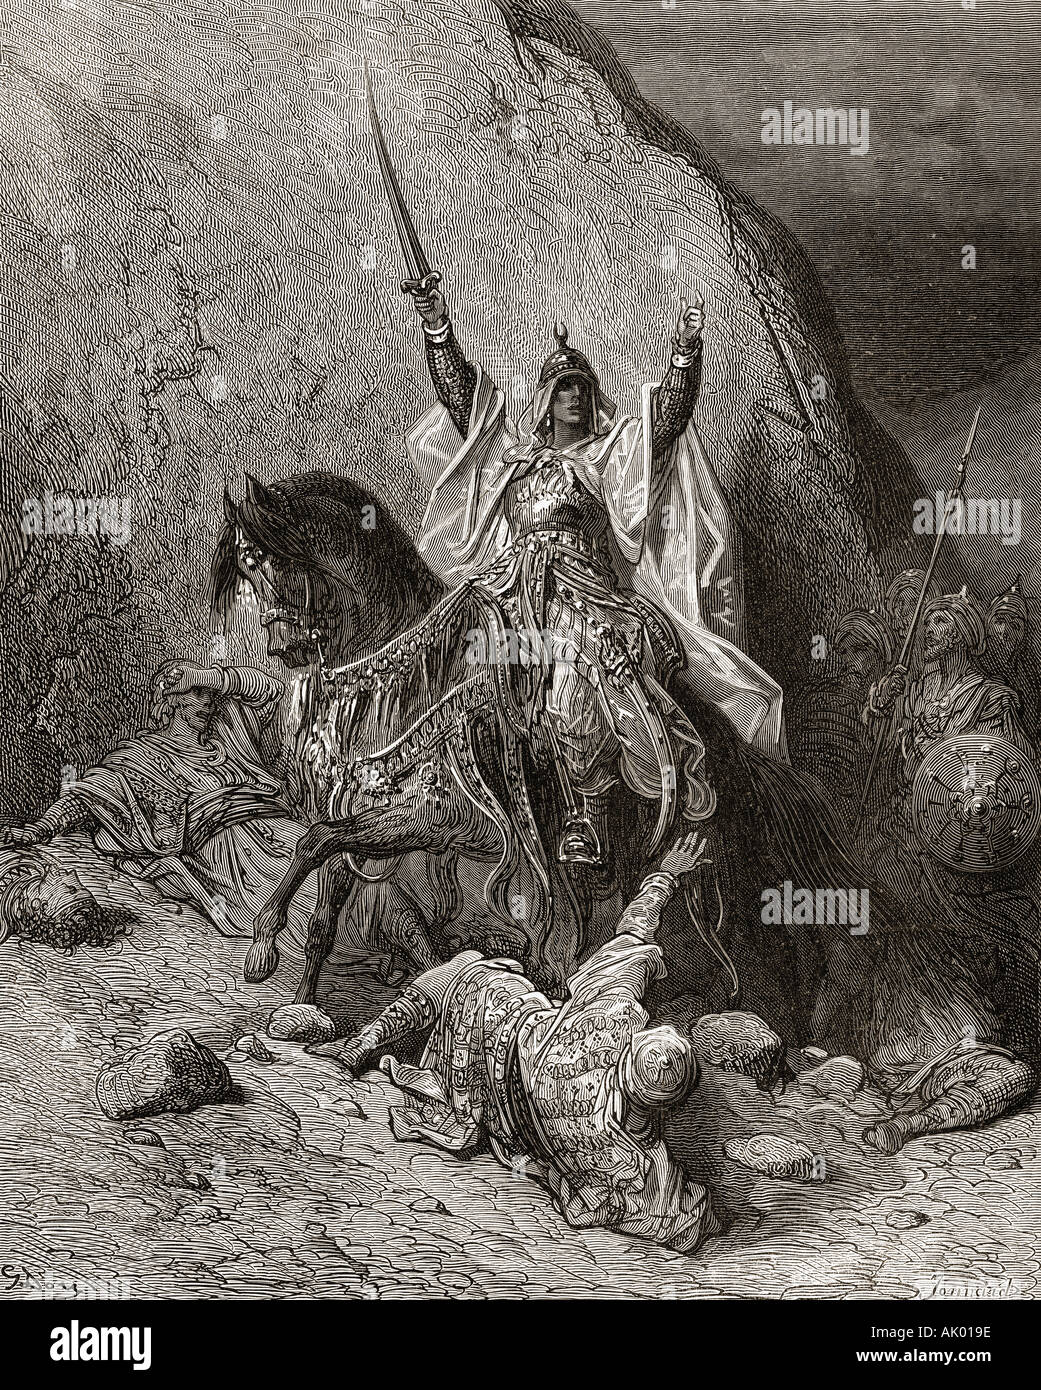 Saladin Salah ed Din Yusuf. An-Nasir Salah ad-Din Yusuf ibn Ayyub, aka Salah ad-Din or Saladin, 1137-1193. First sultan of Egypt and Syria - Stock Image